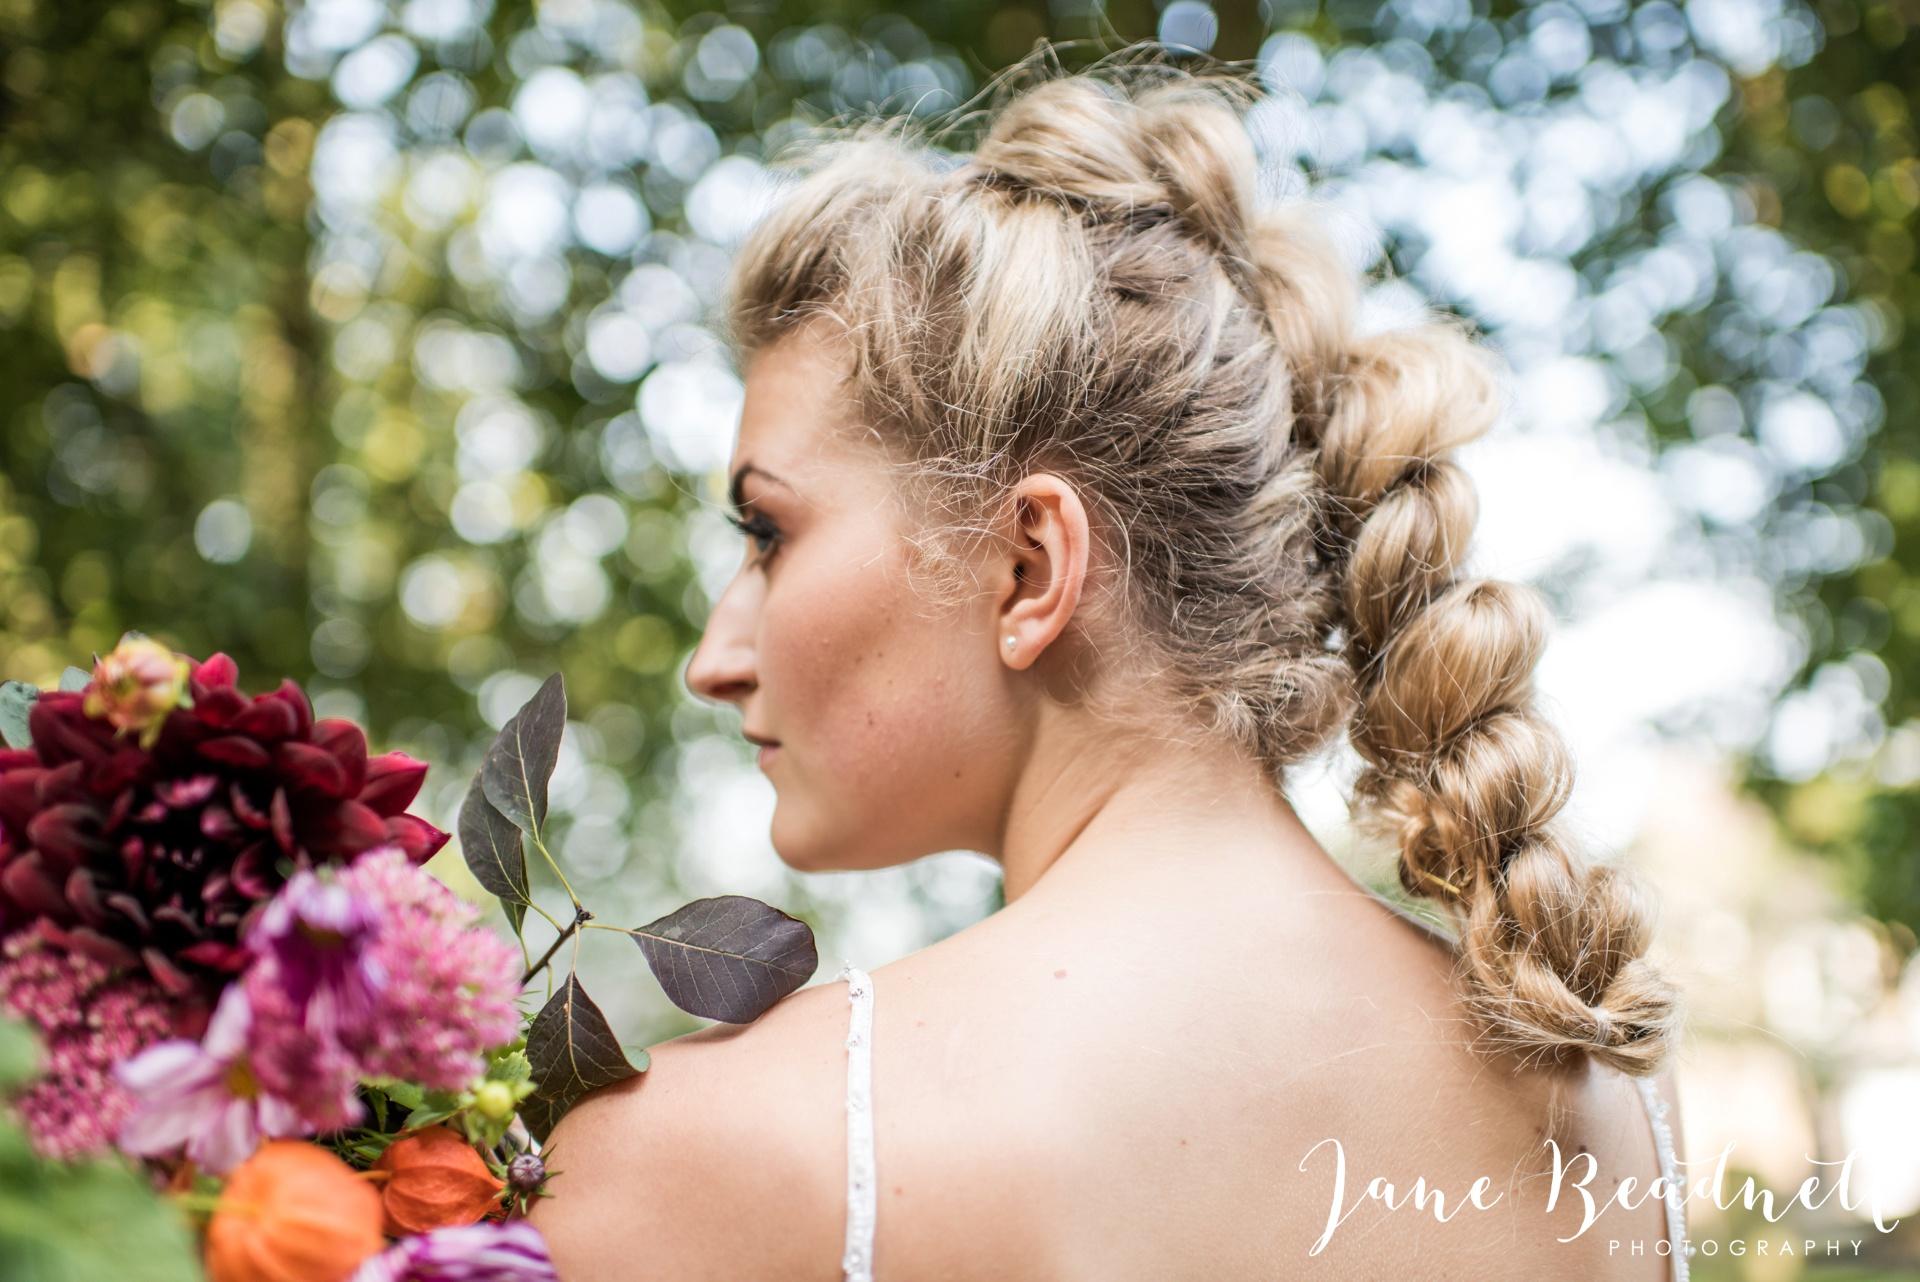 leafy-couture-wedding-flowers-otley-fine-art-wedding-photographer-jane-beadnell-photography_0009